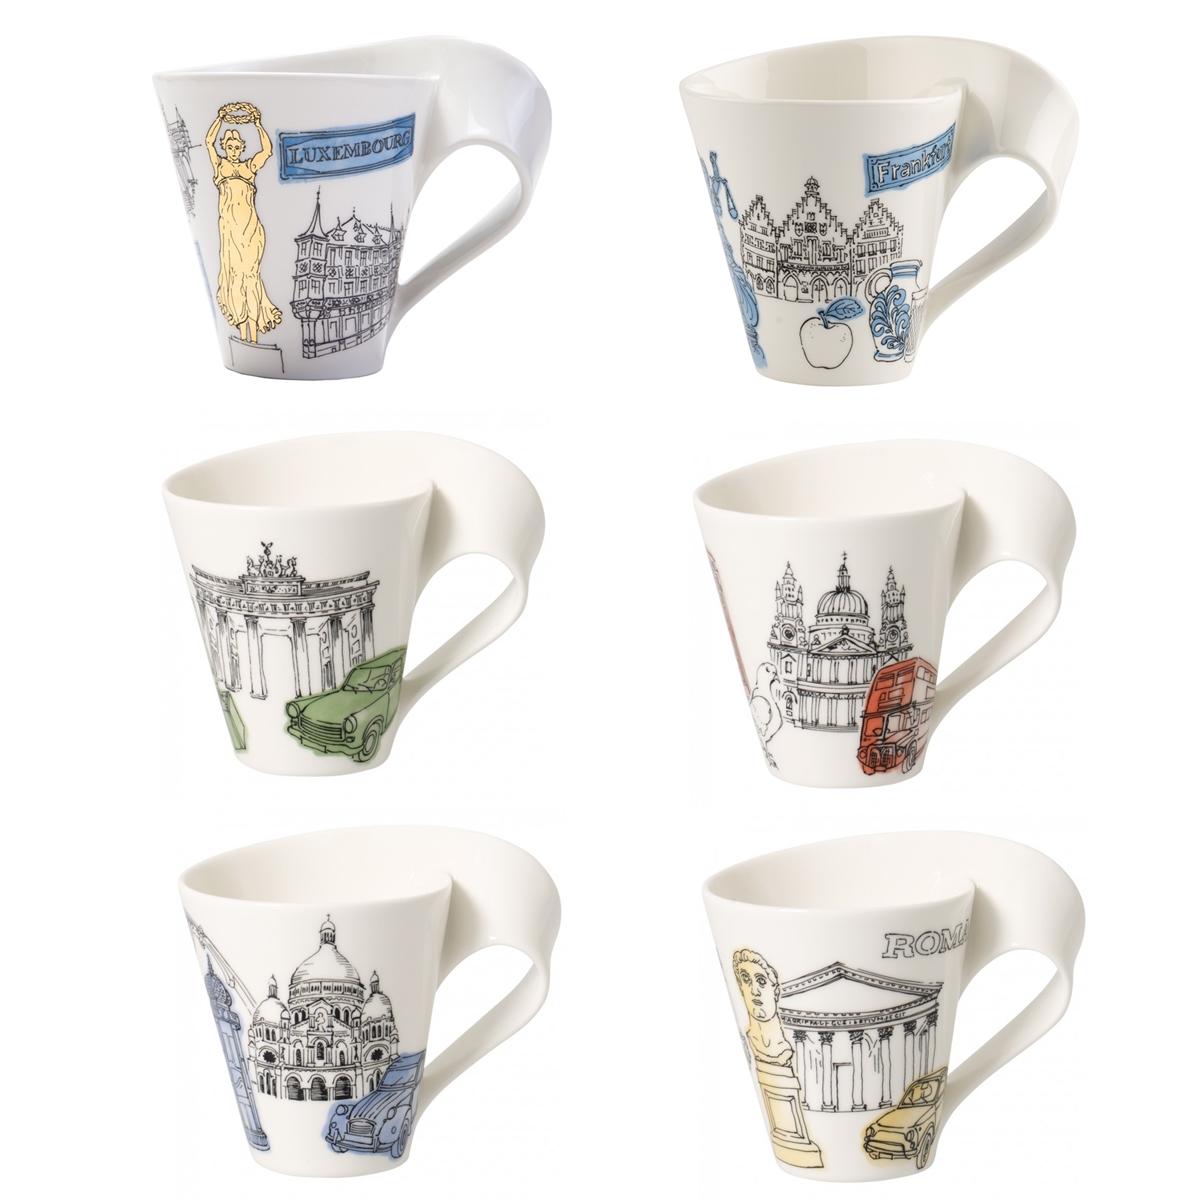 villeroyboch德国唯宝时尚杯浪马克杯创意咖啡杯家用水杯礼盒套装